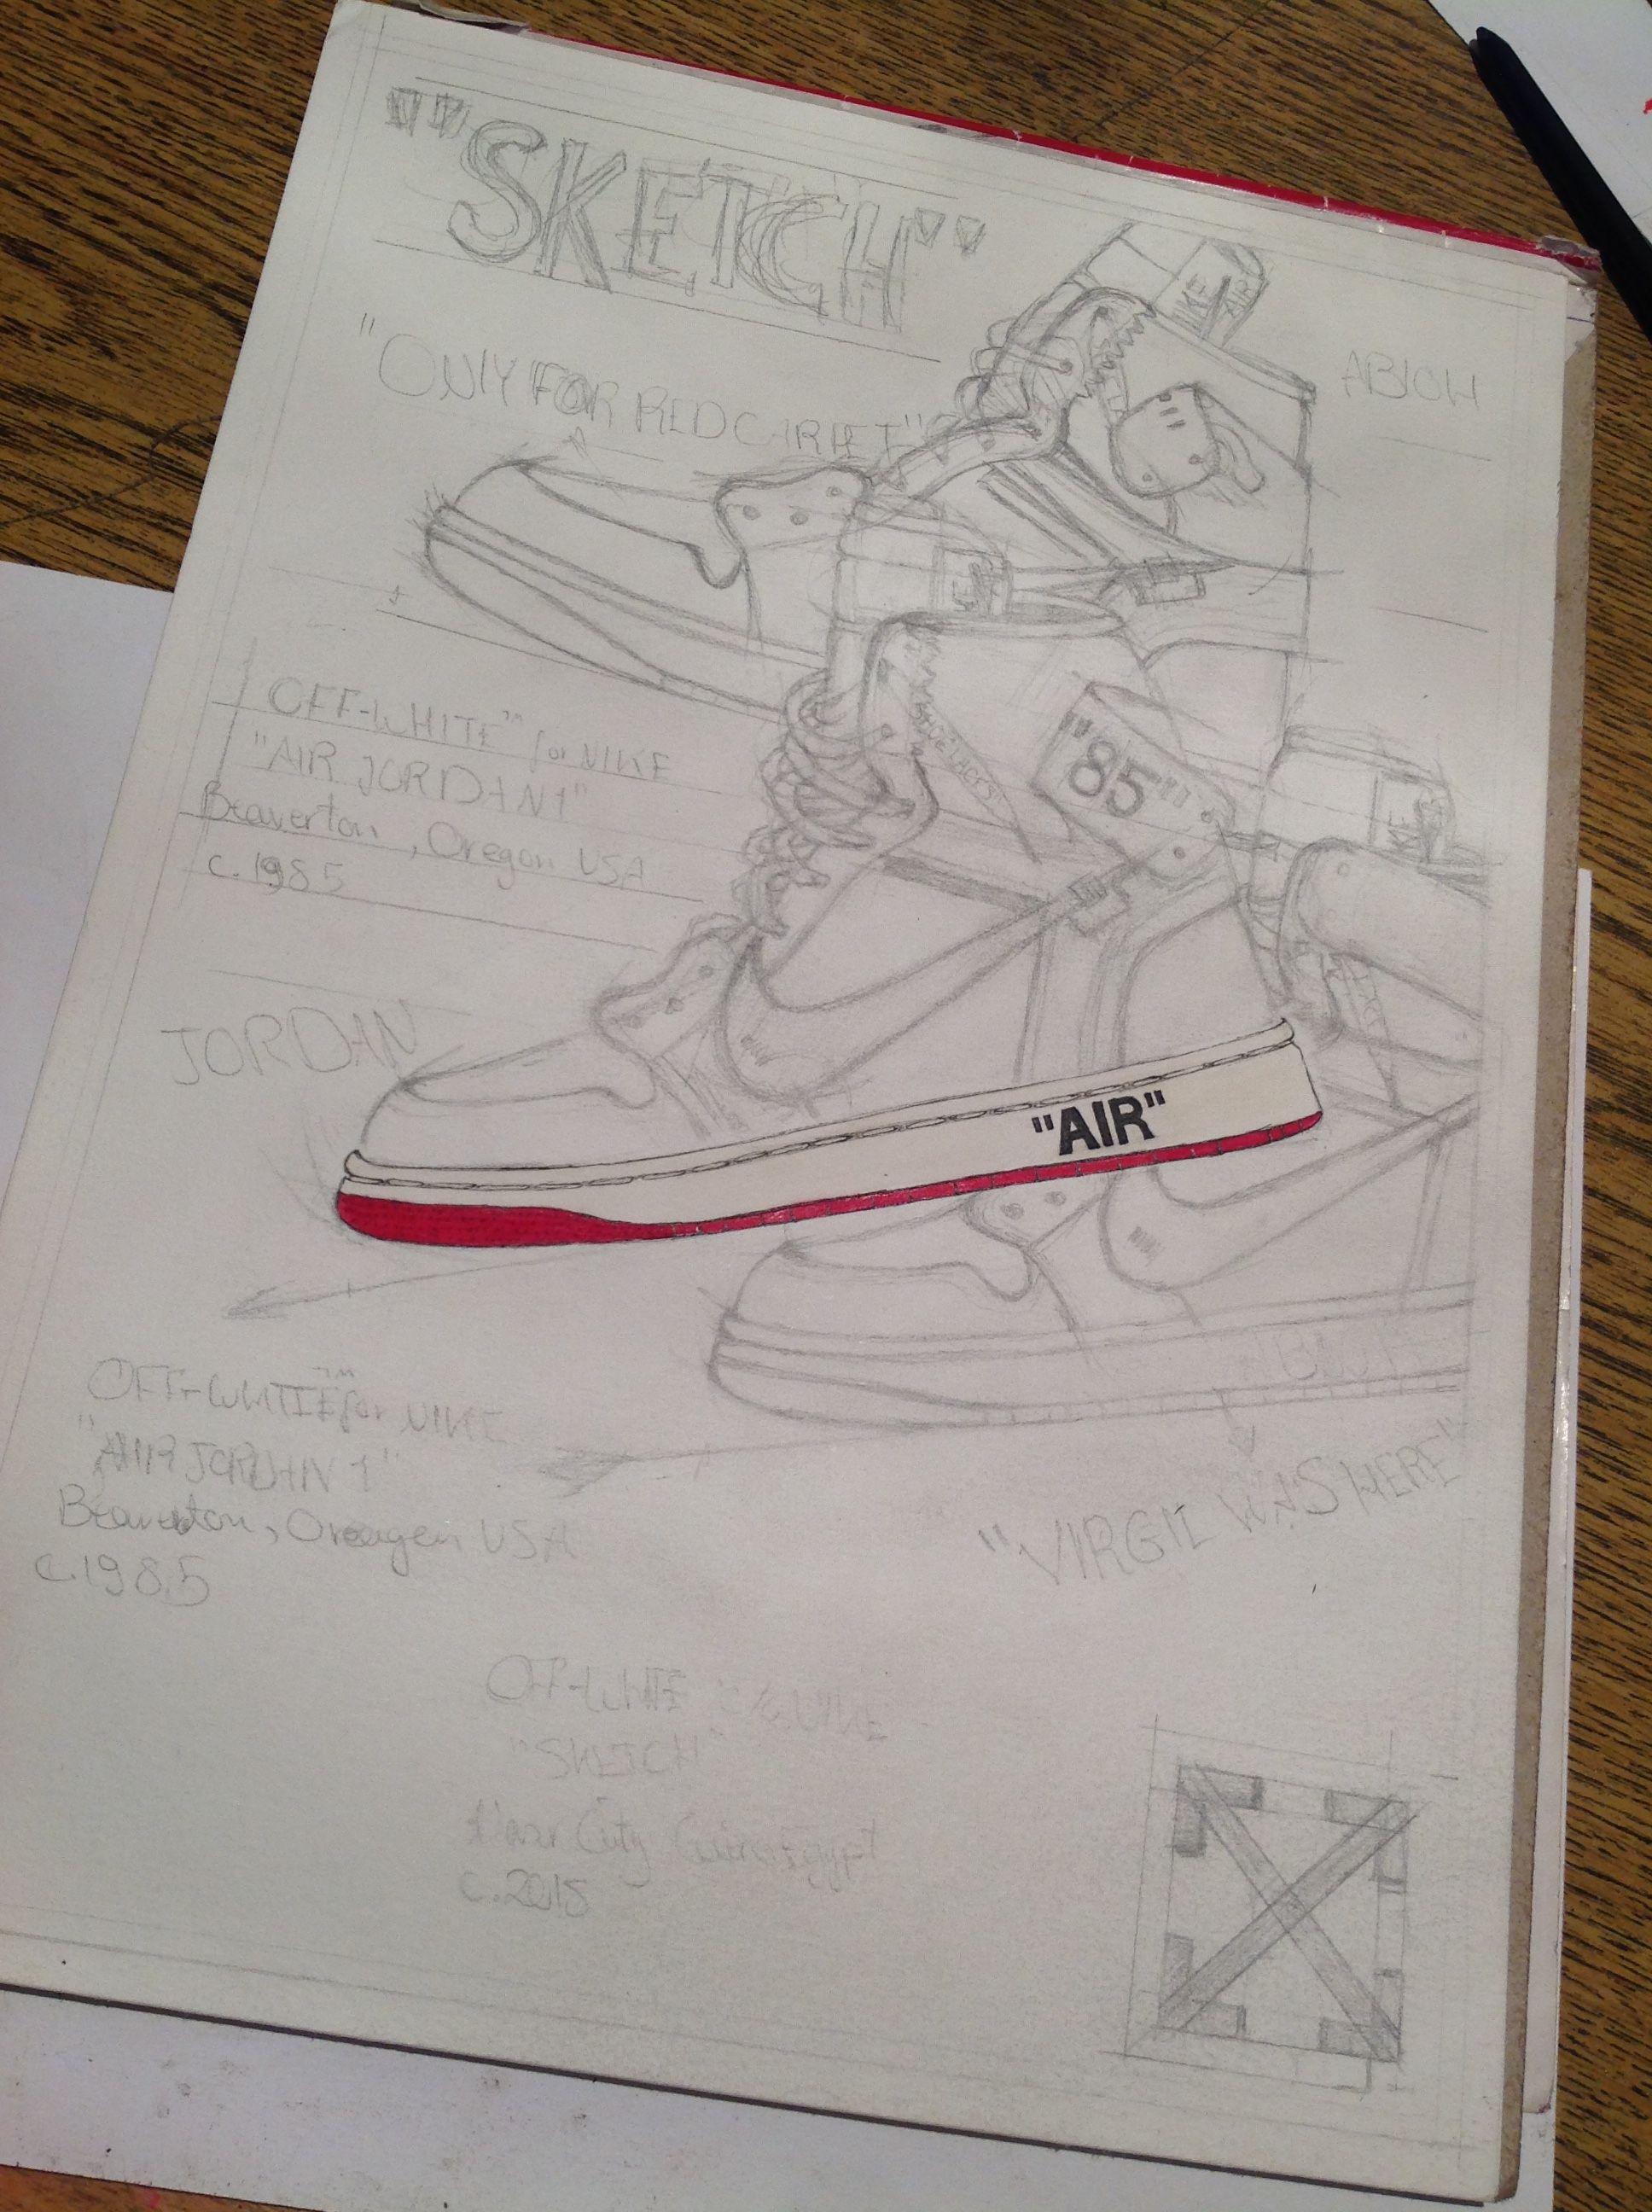 Air Jordan 1 X Off White Chicago White Unc First